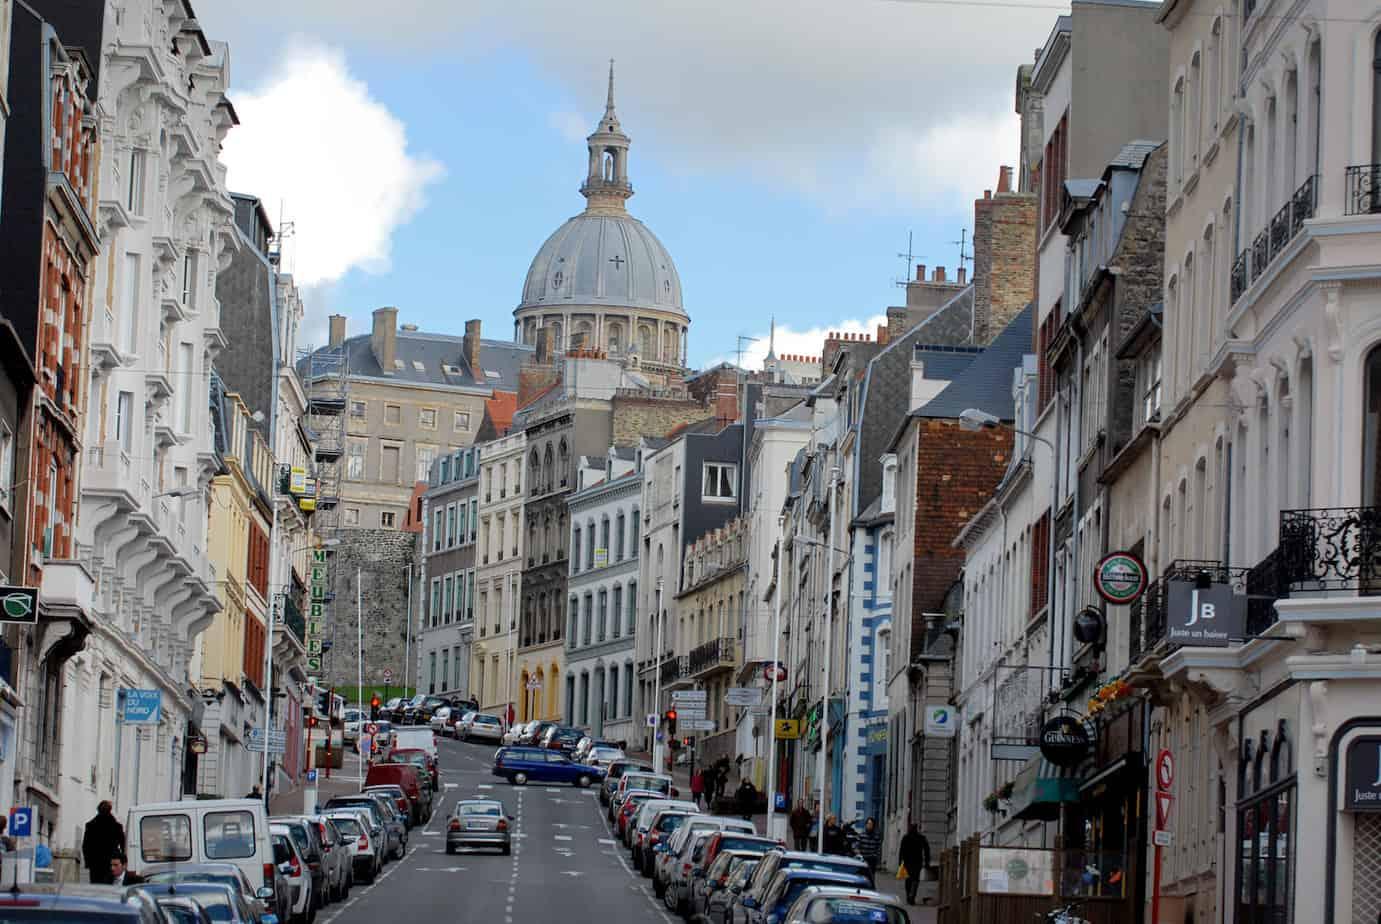 De straten van Boulogne-sur-Mer